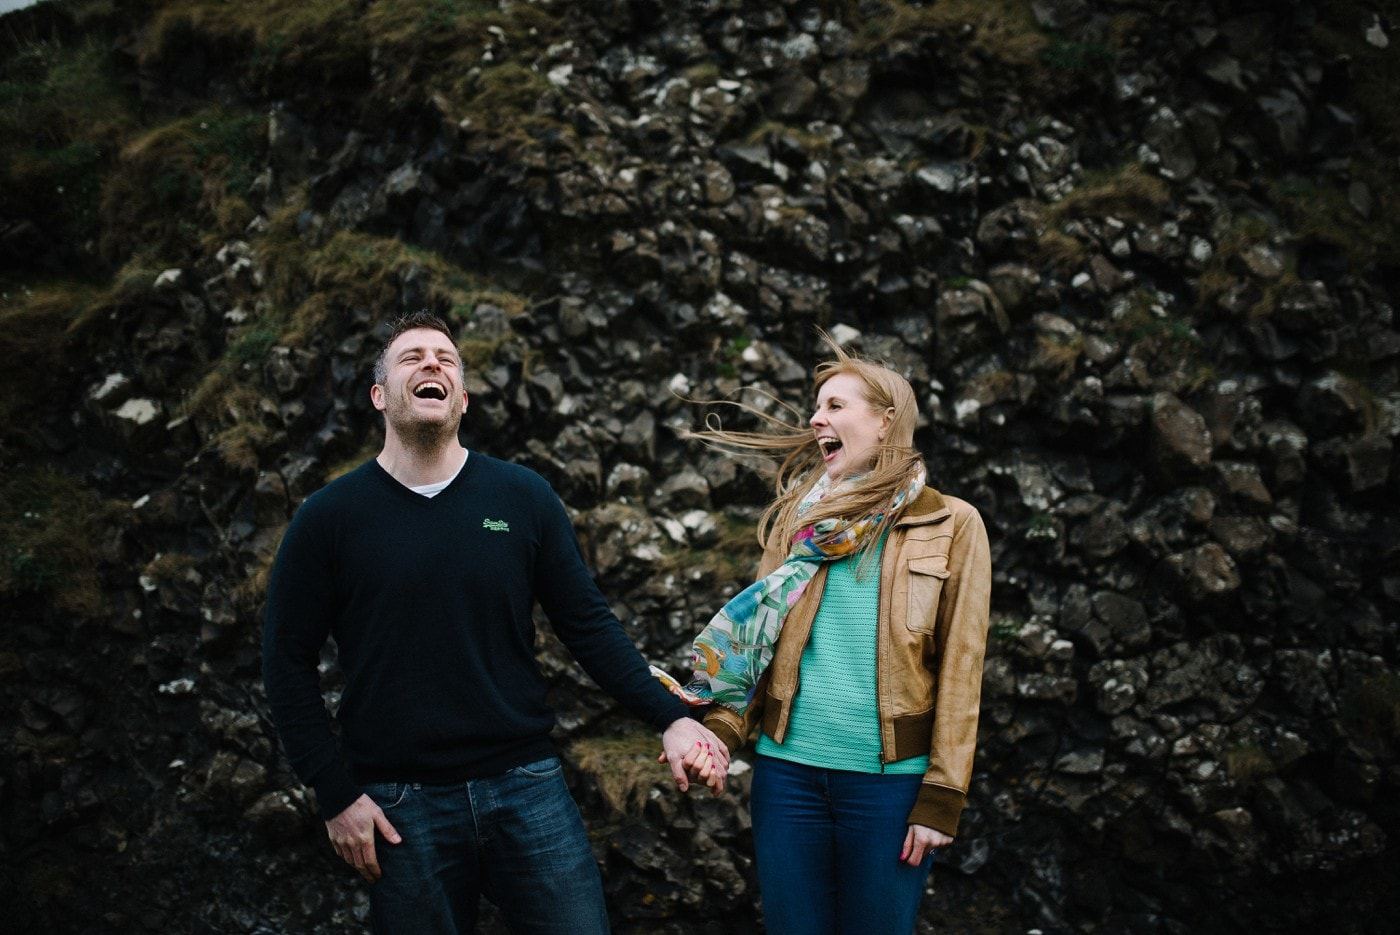 ballintoy-harbour-engagement-wedding-photographer-northern-ireland_0011